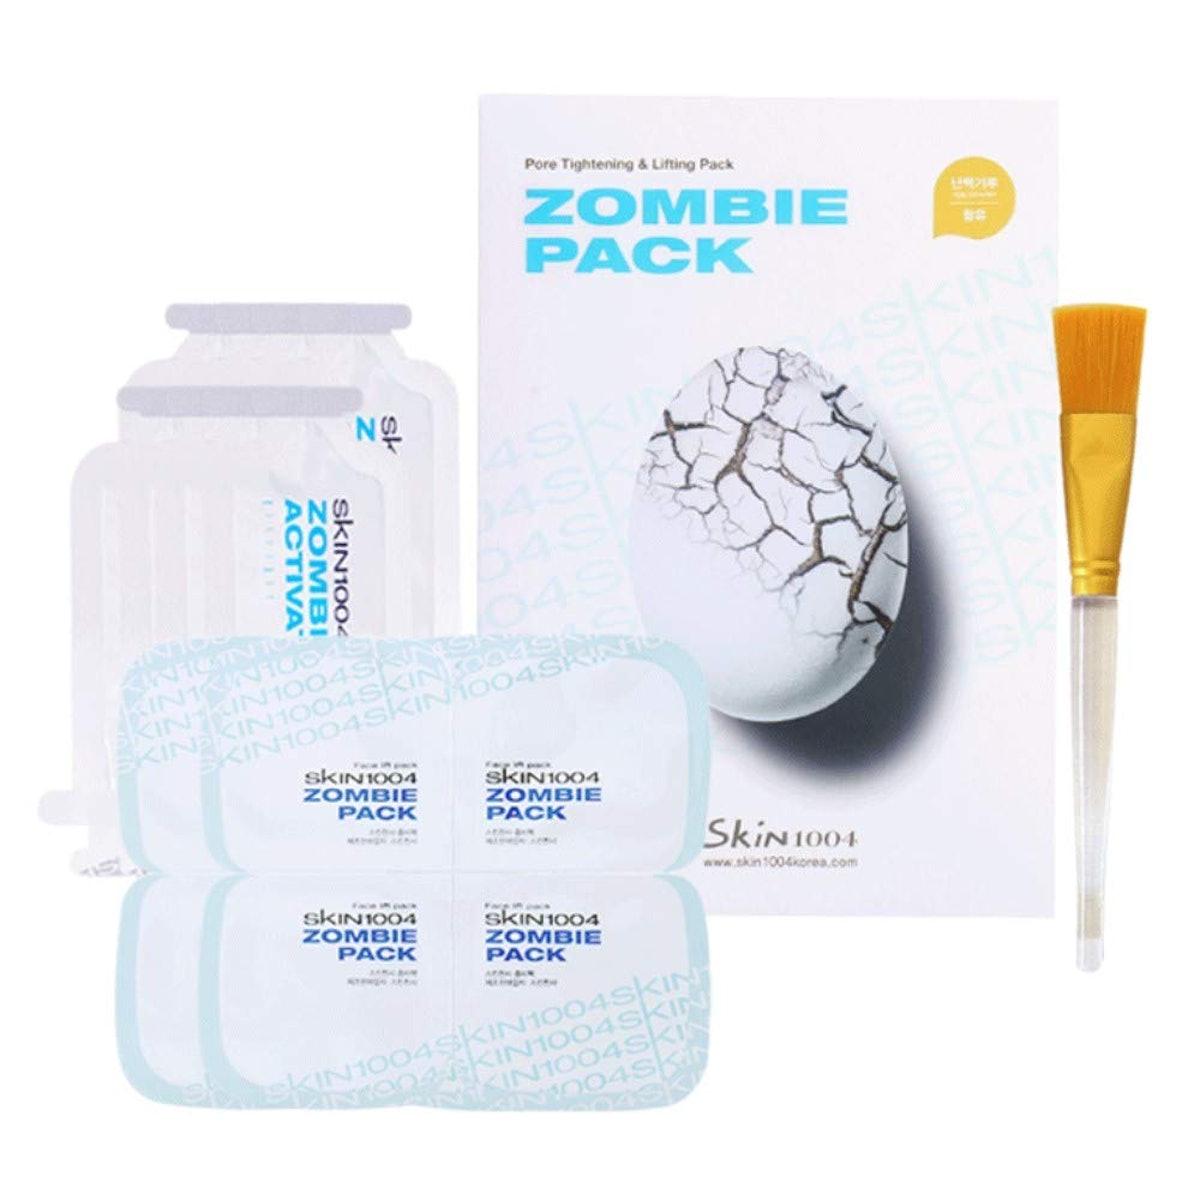 Skin1004 Zombie Face Mask (8 Masks)